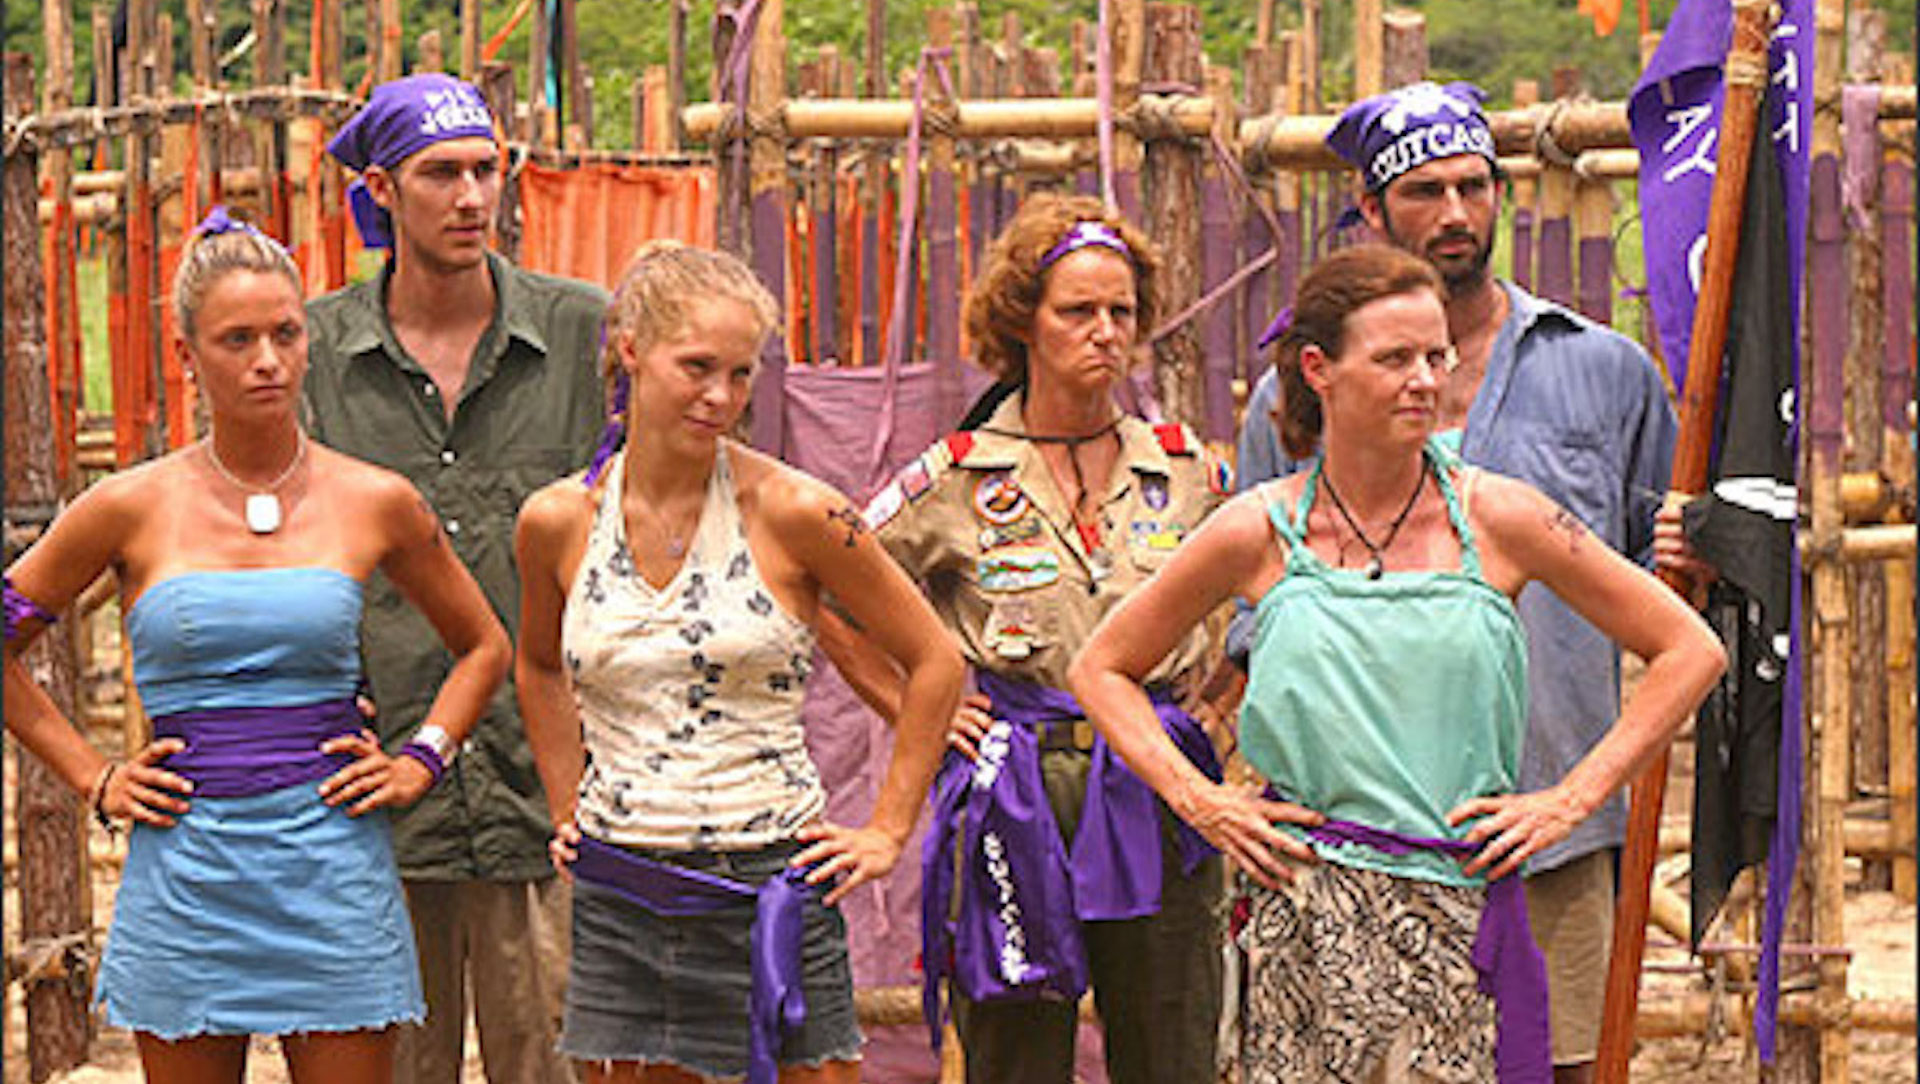 Eliminated contestants return